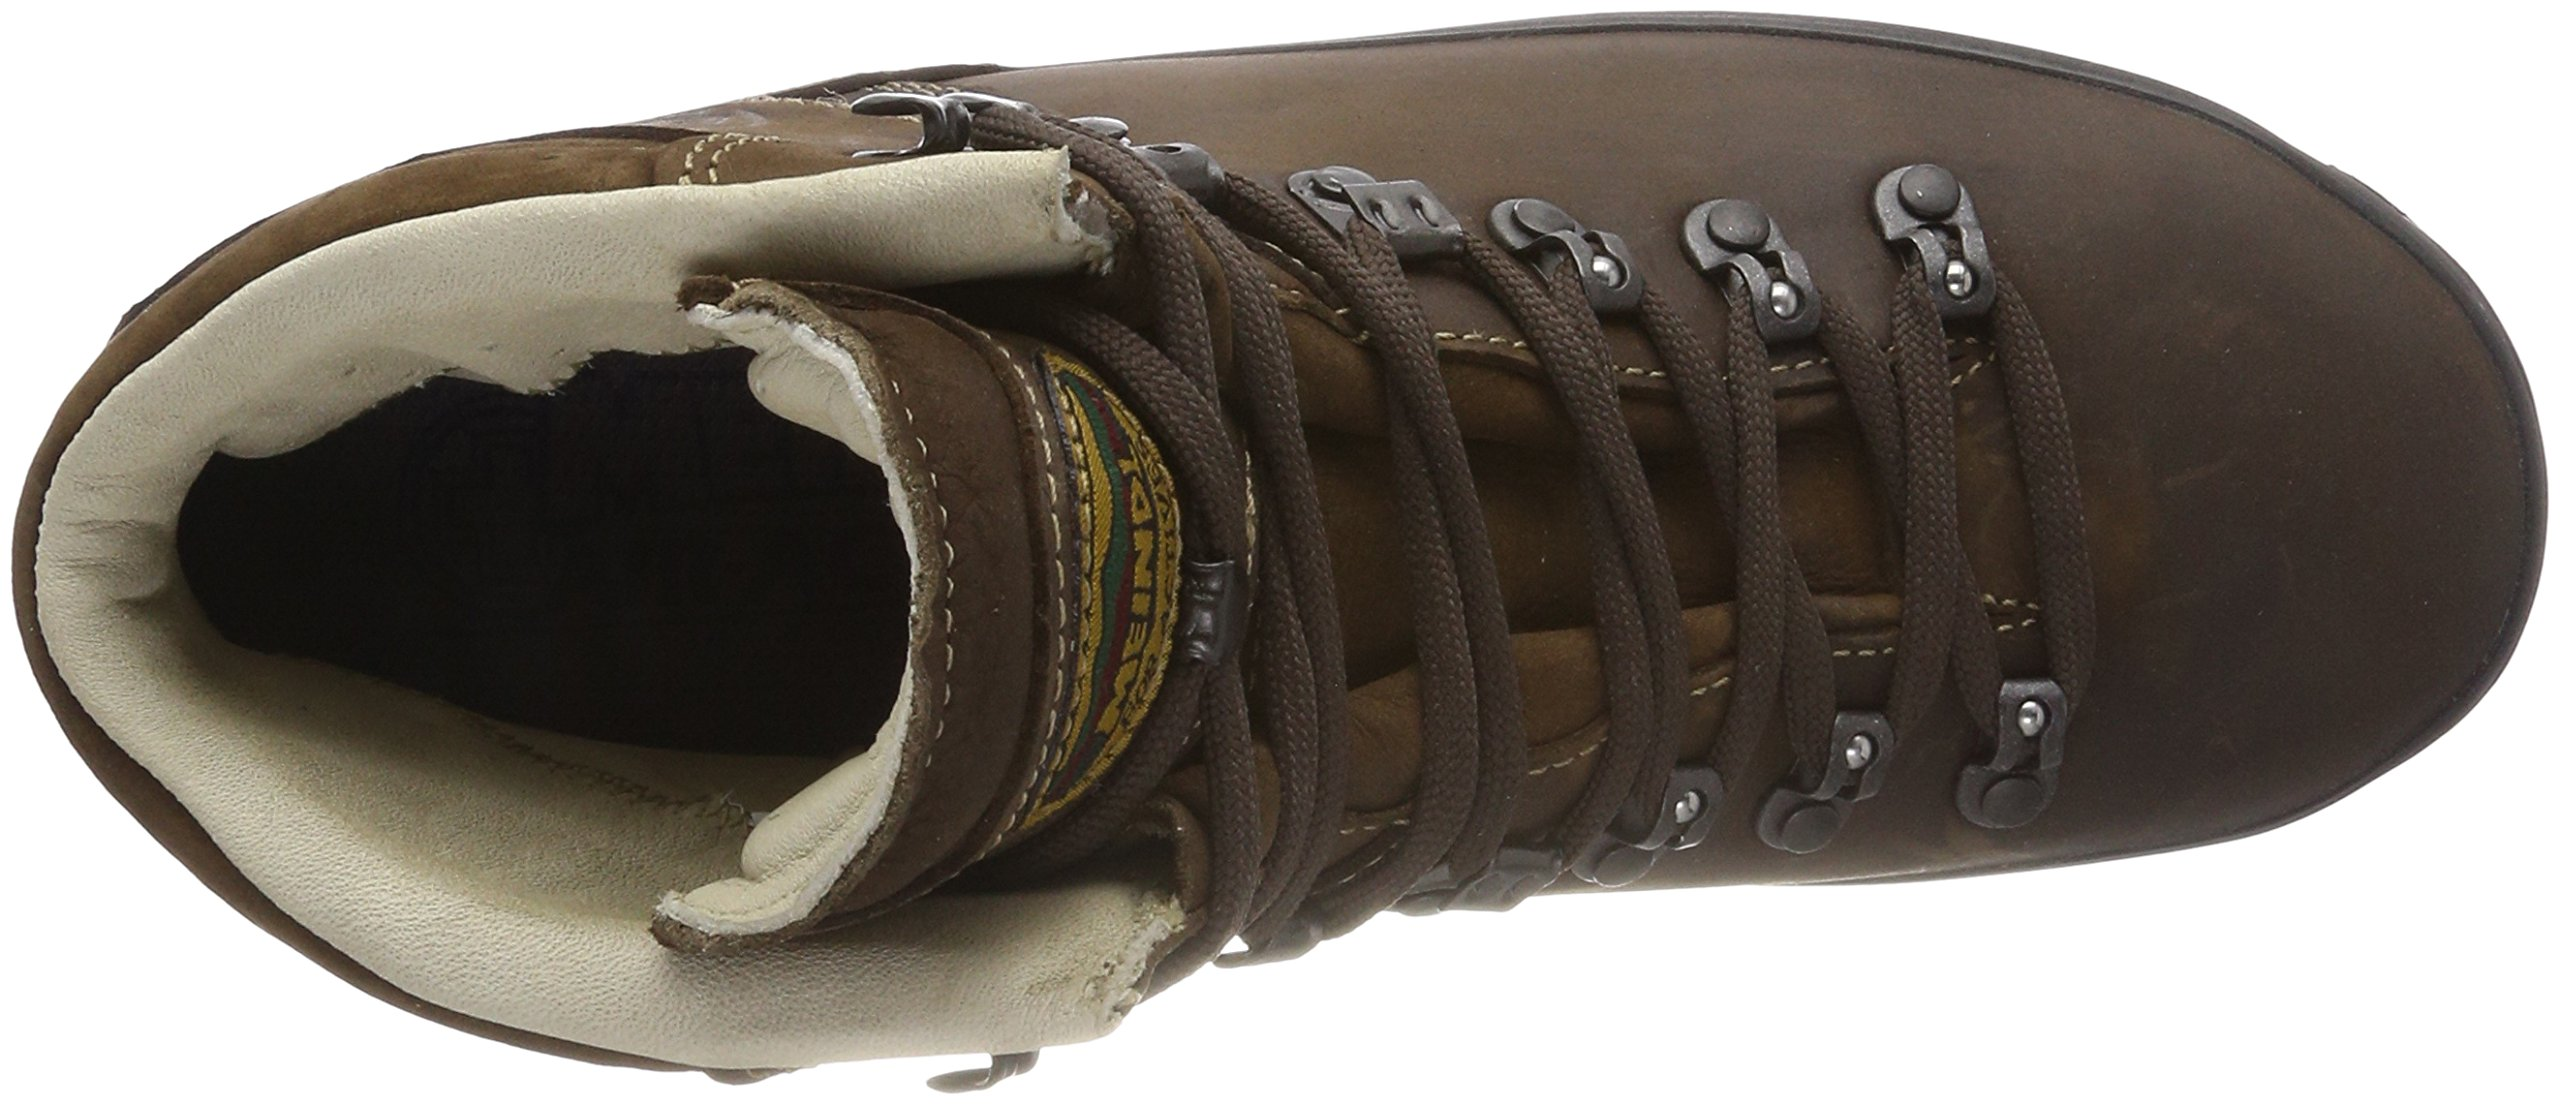 81IQxvi2ZkL - Meindl Women's Borneo Lady 2 MFS (XL) High Rise Hiking Shoes